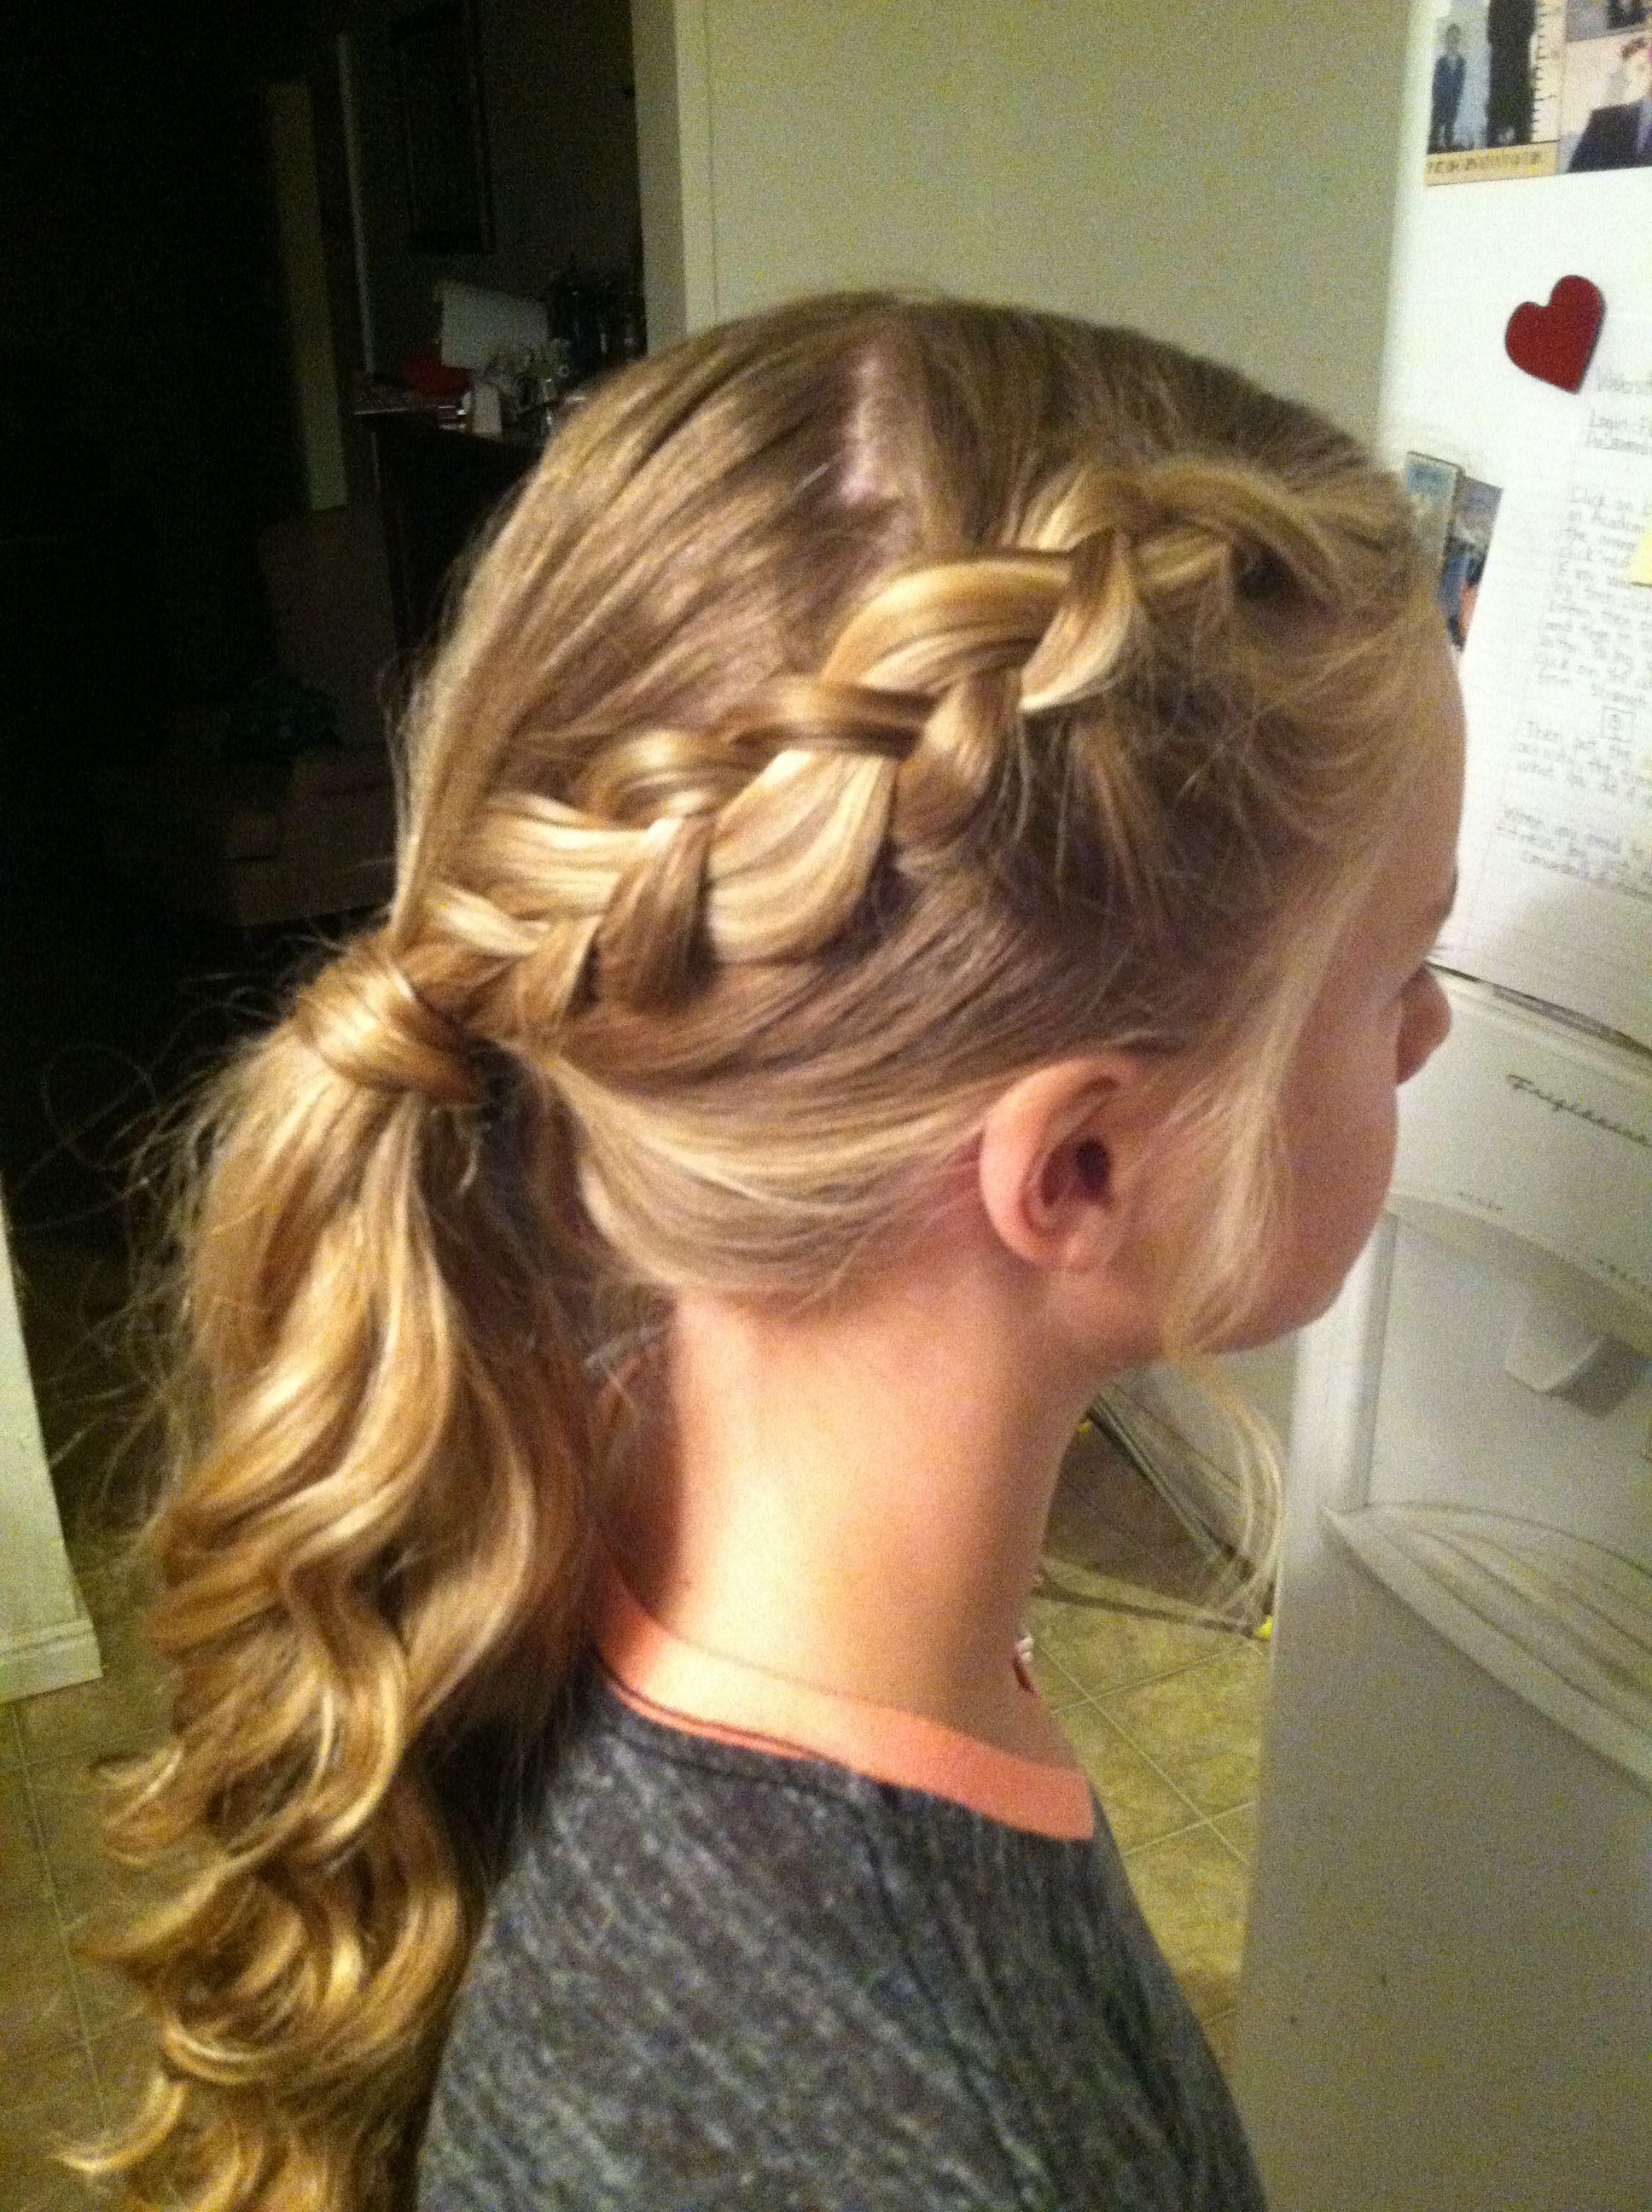 Braid into curly ponytail festligheter pinterest curly